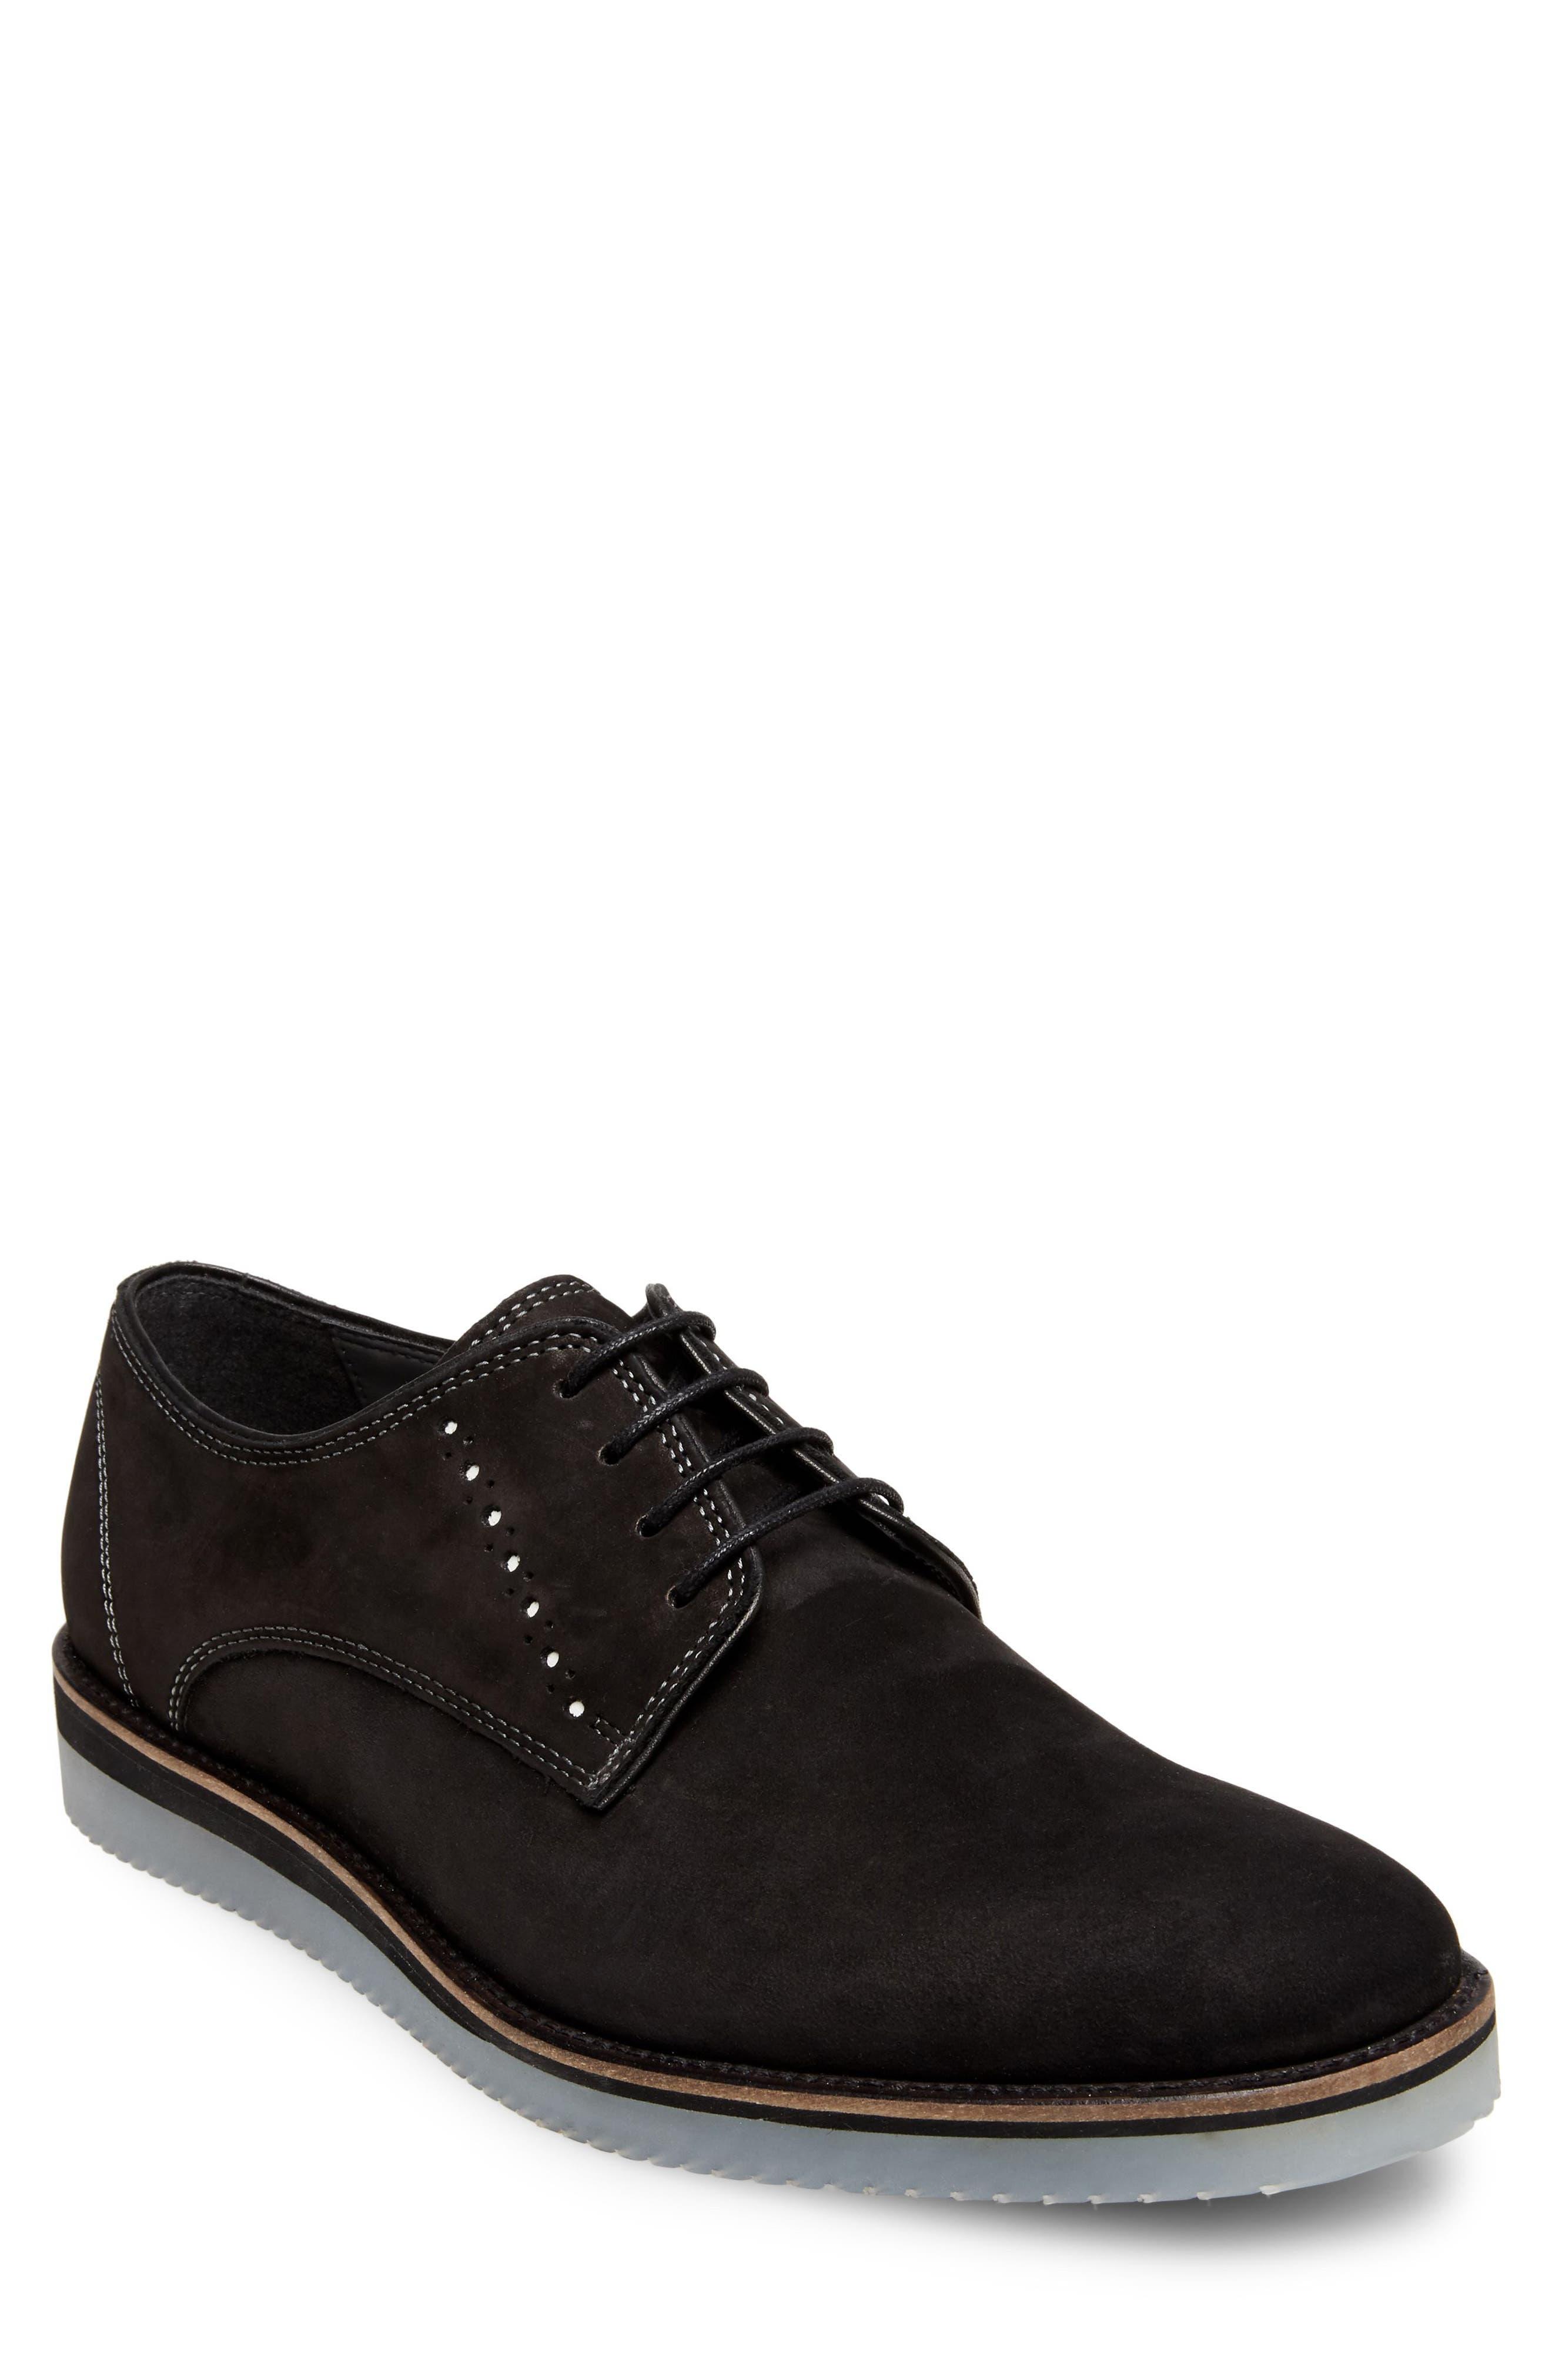 Inquest Plain Toe Derby,                         Main,                         color, BLACK NUBUCK